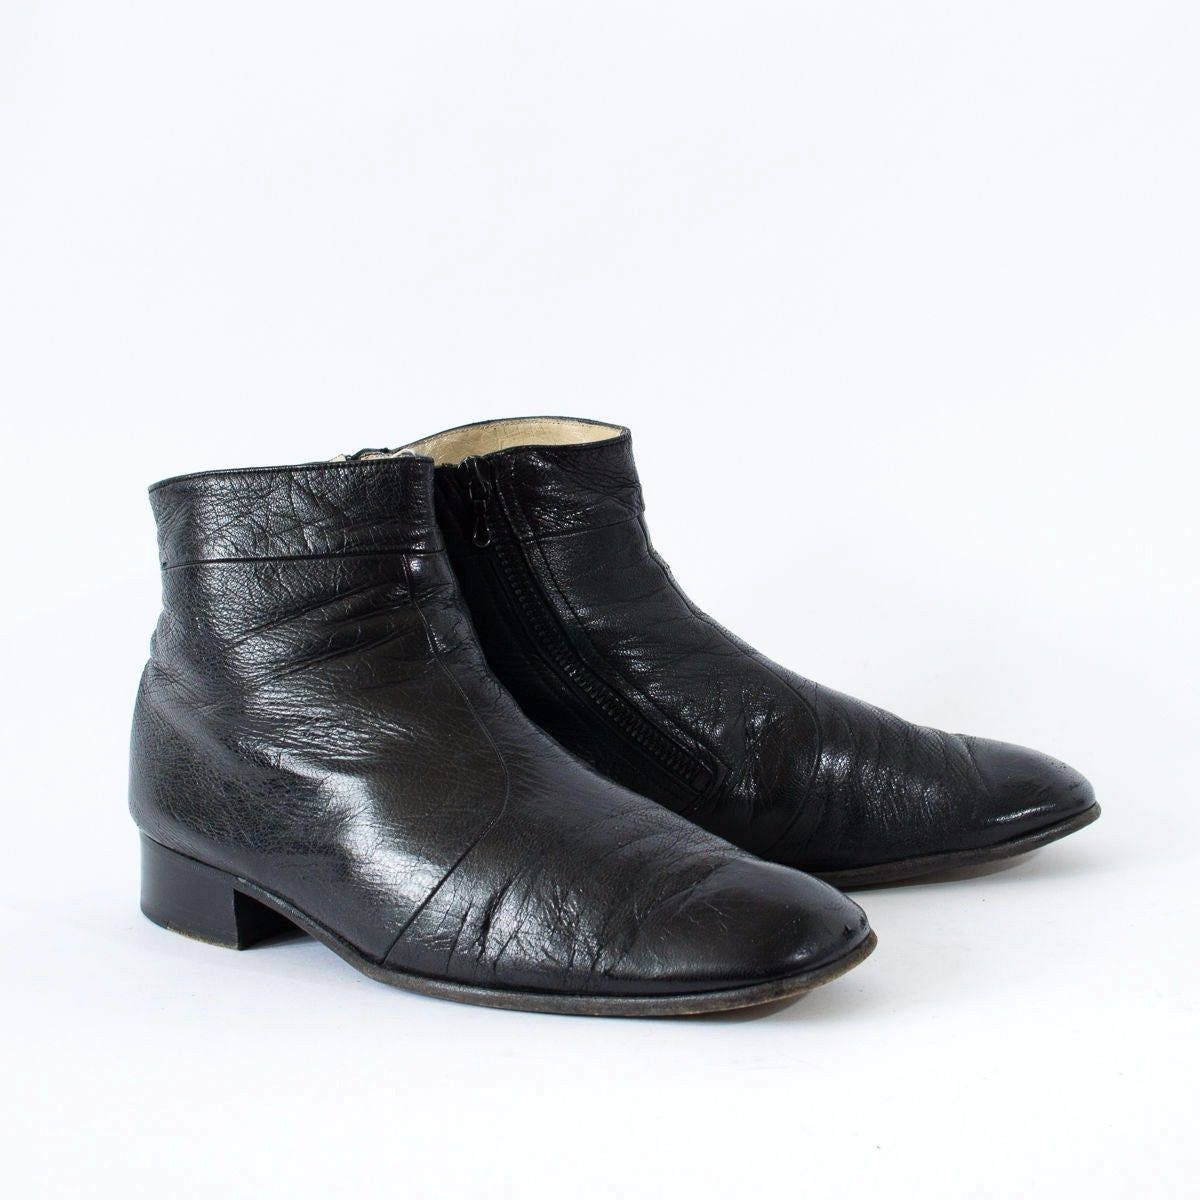 Vintage Black Real Leather Chelsea Boots Womens UK 8.5 EU 42.5 US 10.5